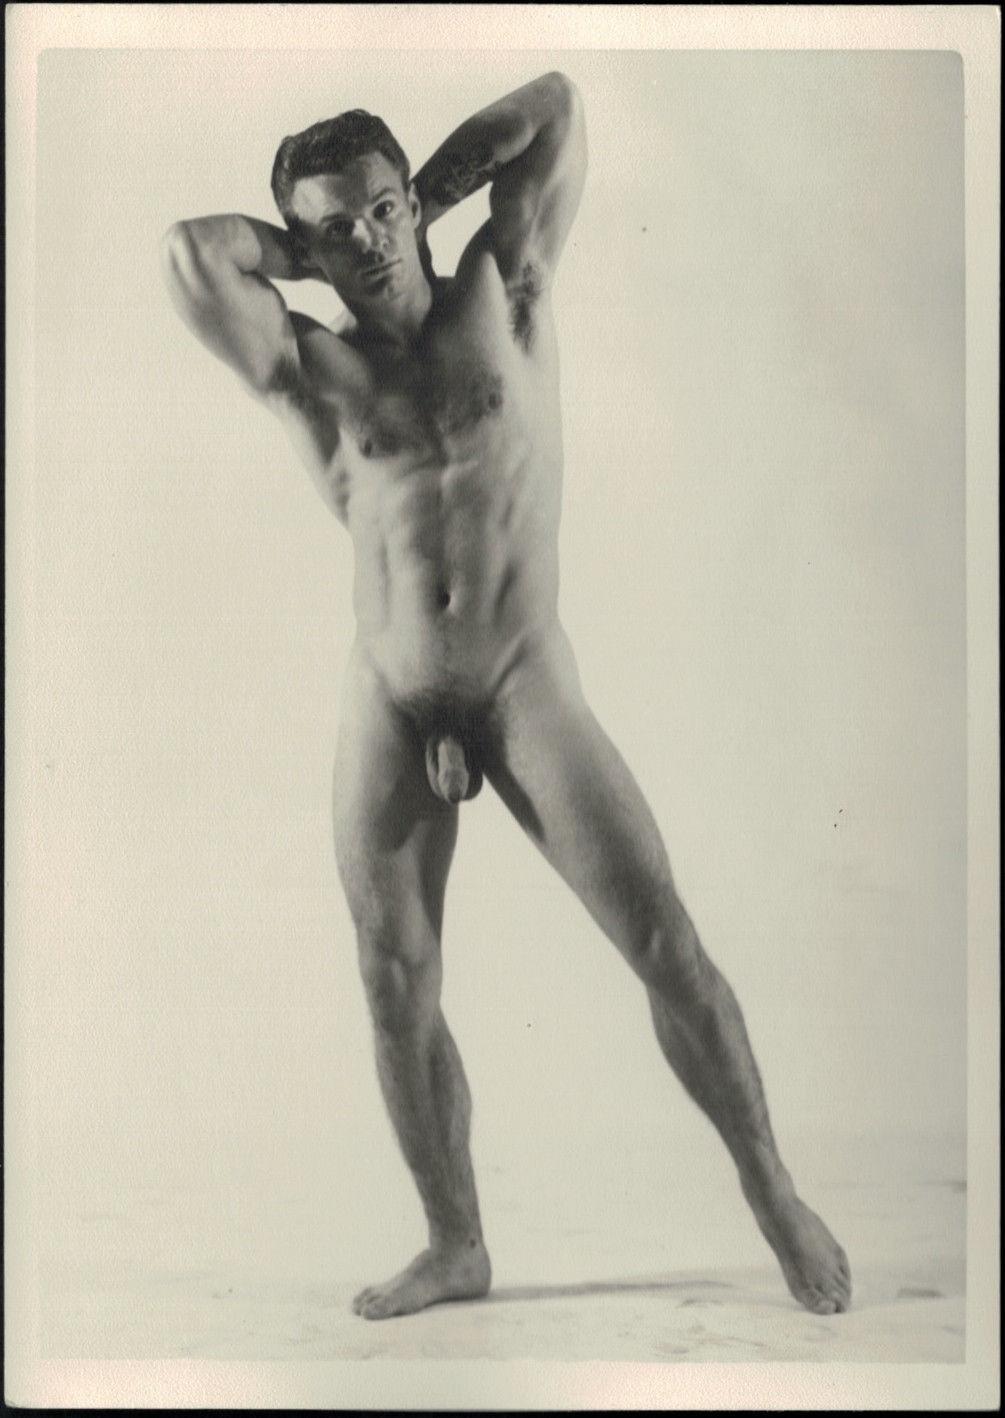 Male Models Vintage Beefcake-7597